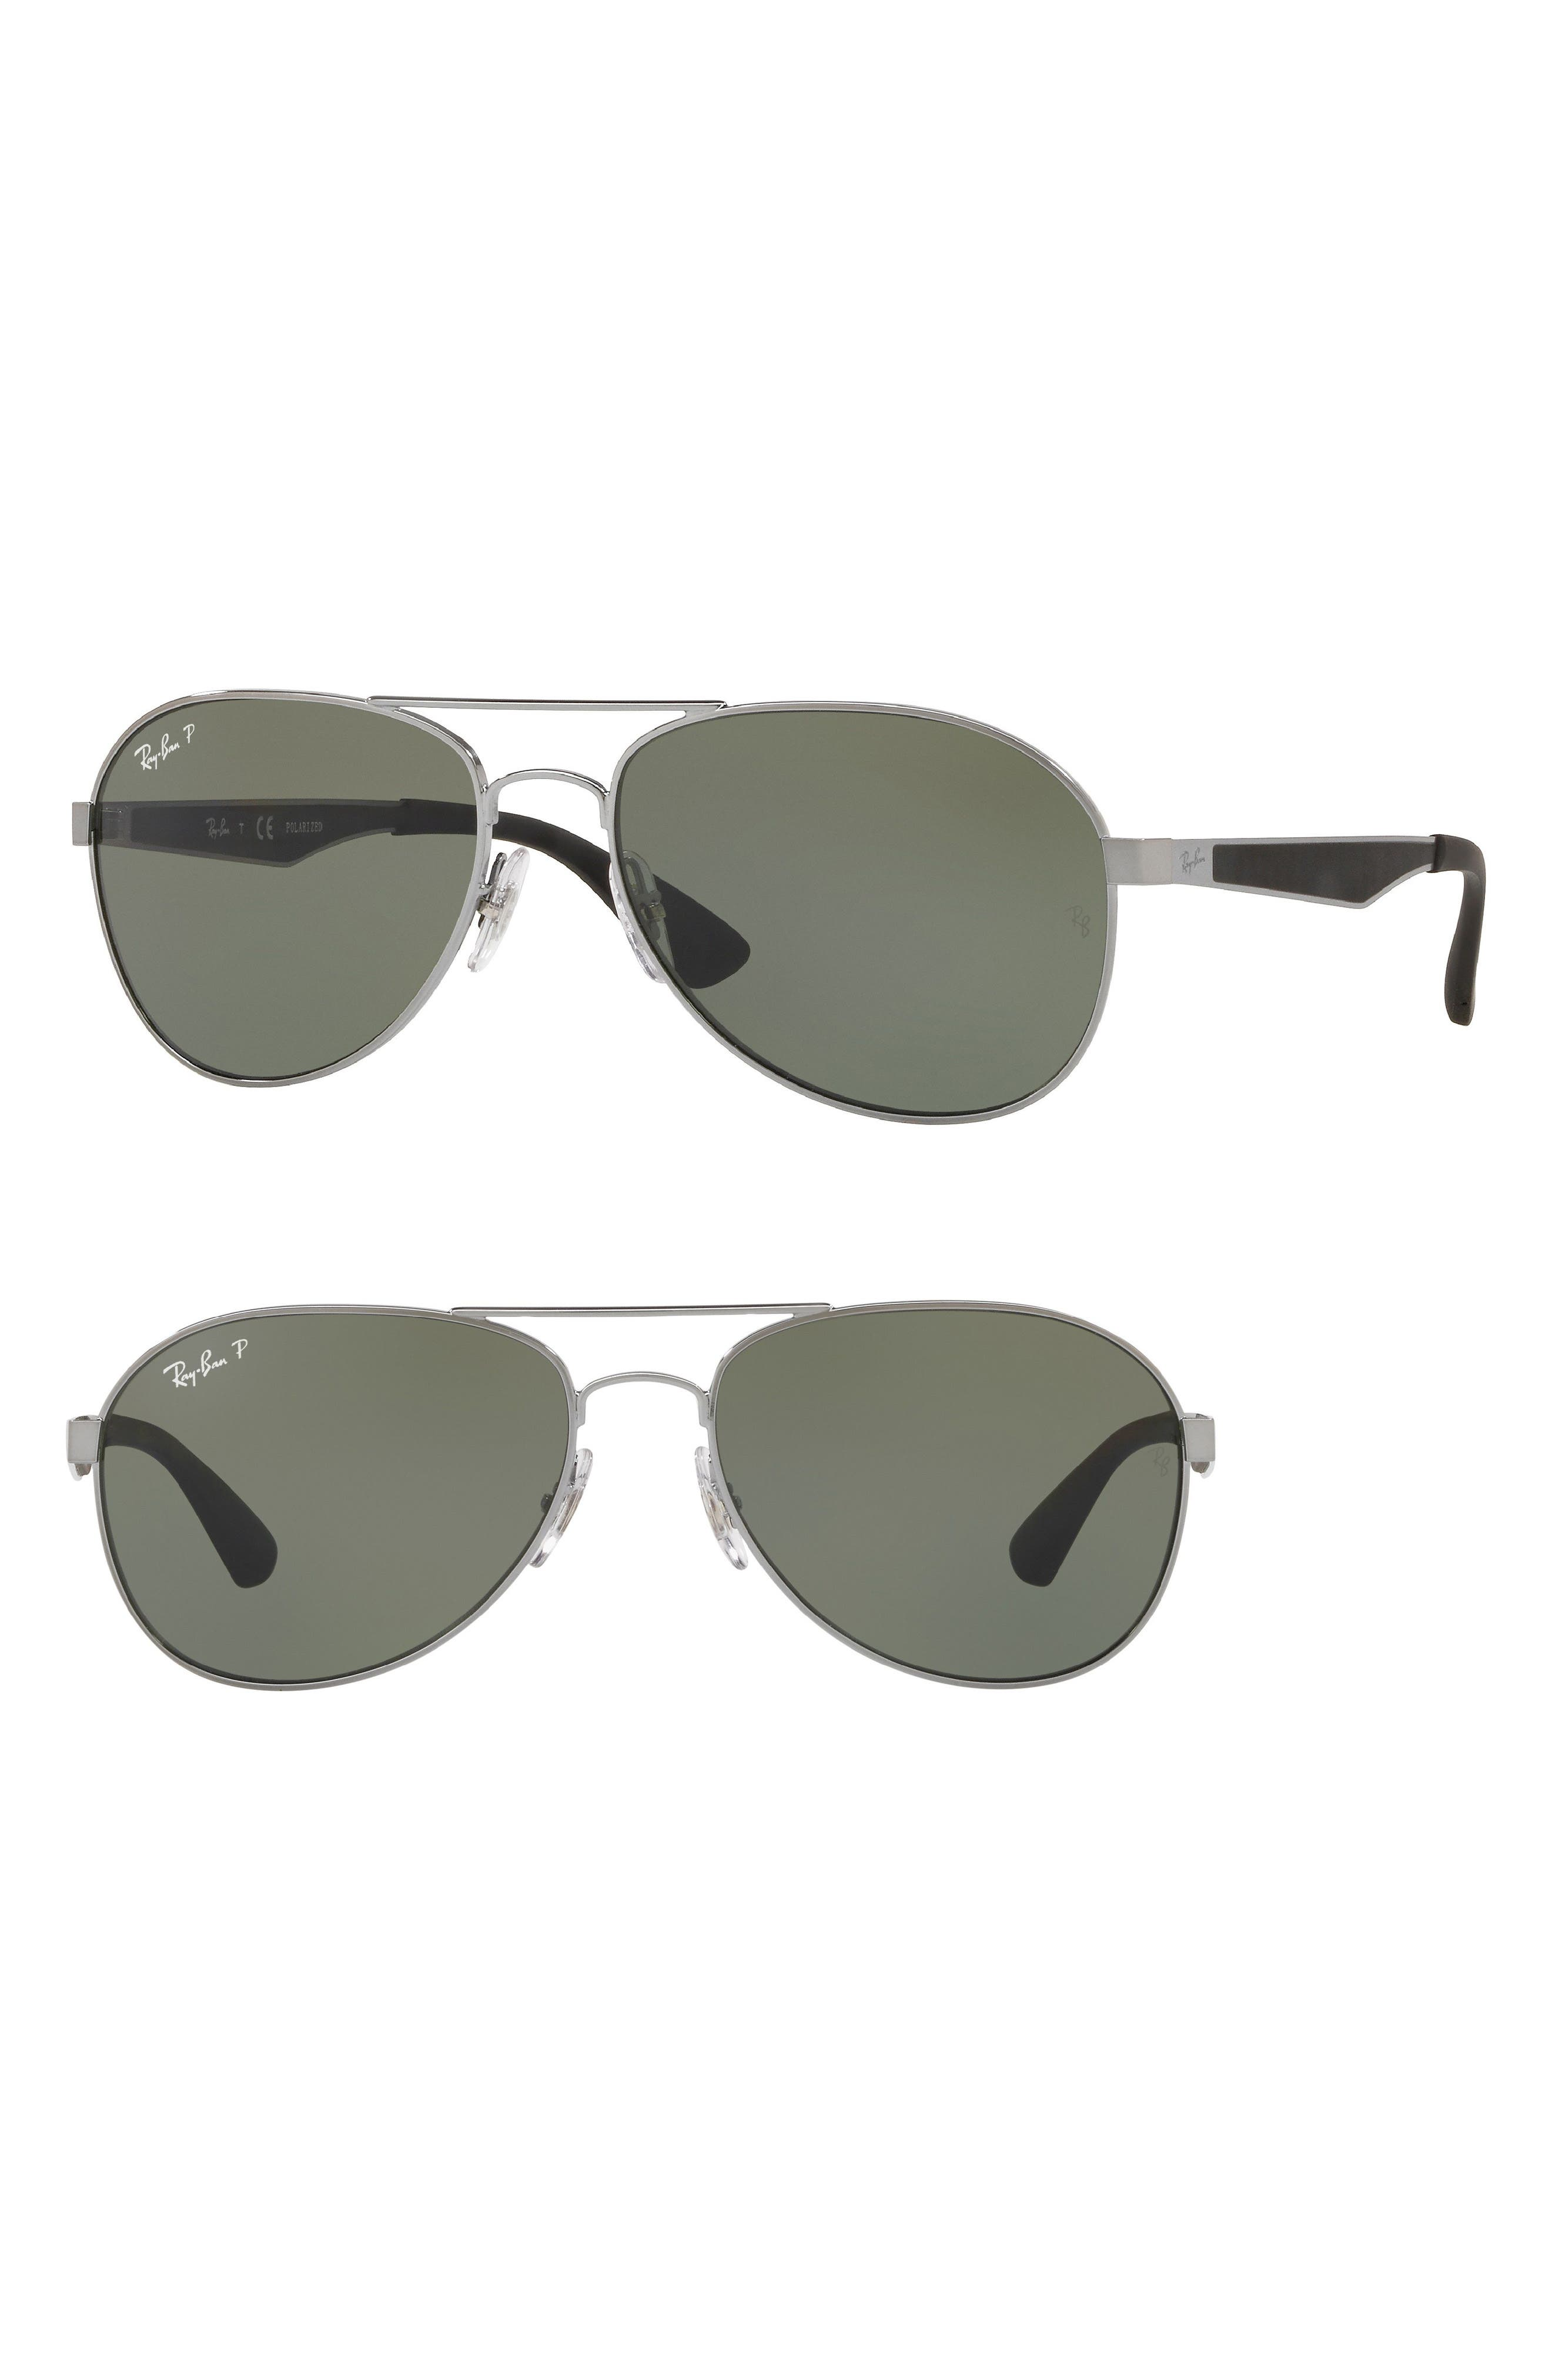 61mm Polarized Aviator Sunglasses,                         Main,                         color, Gunmetal